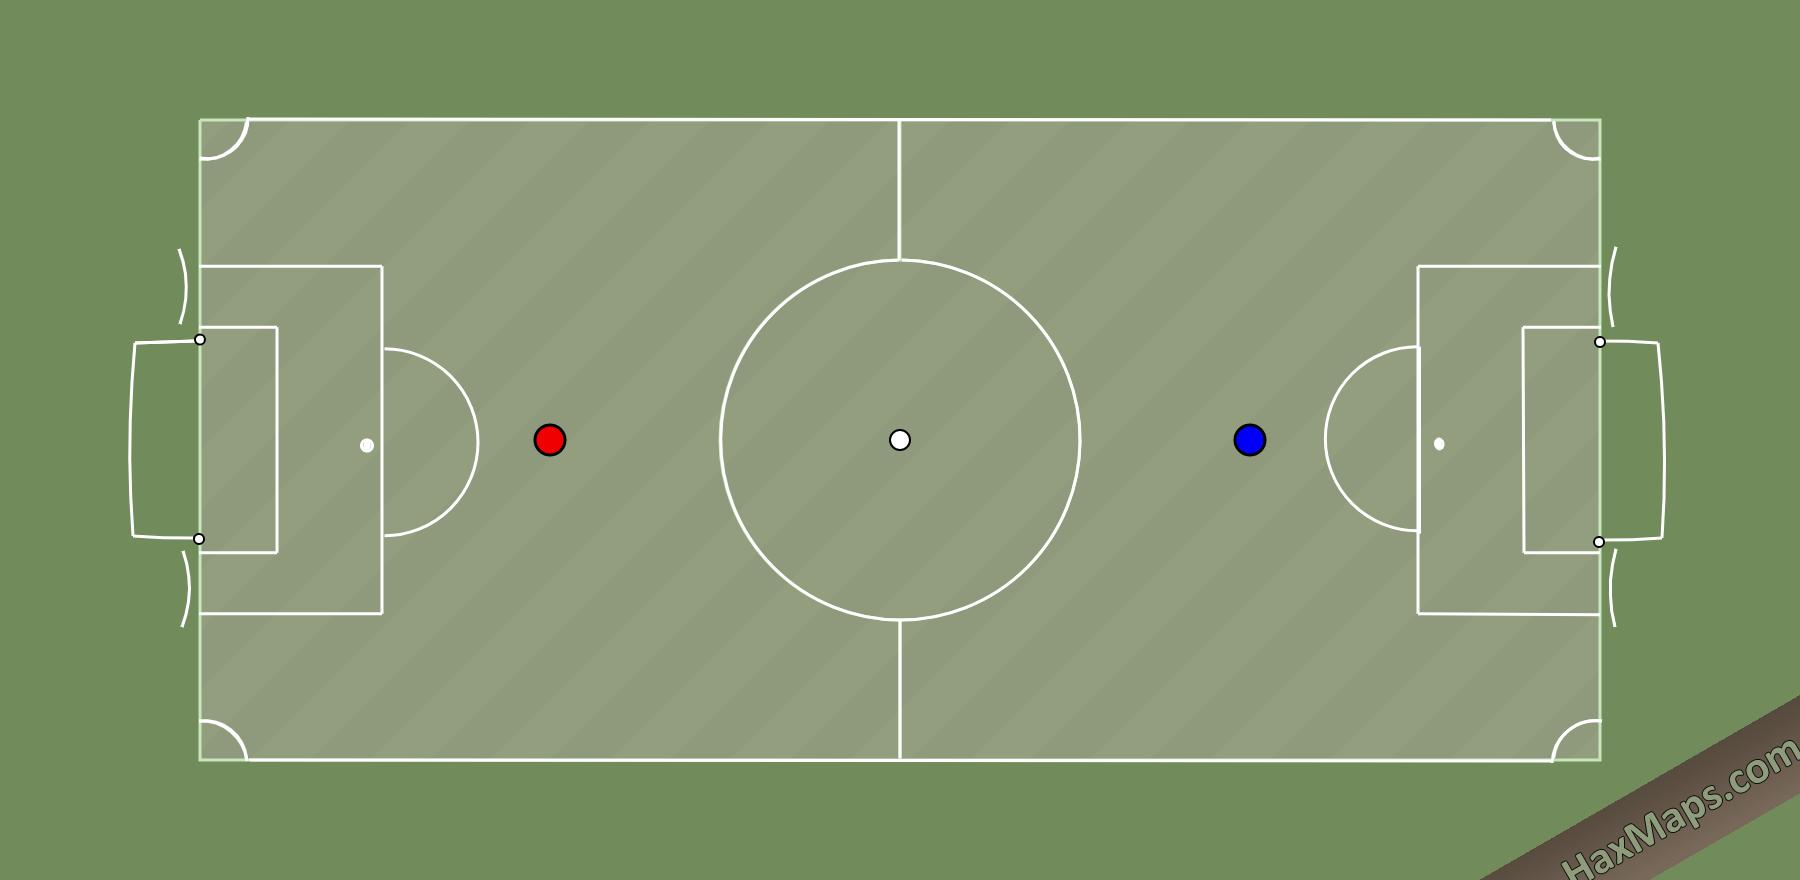 hax ball maps | Palejj Redefine Duvarlı Mini Real Soccer